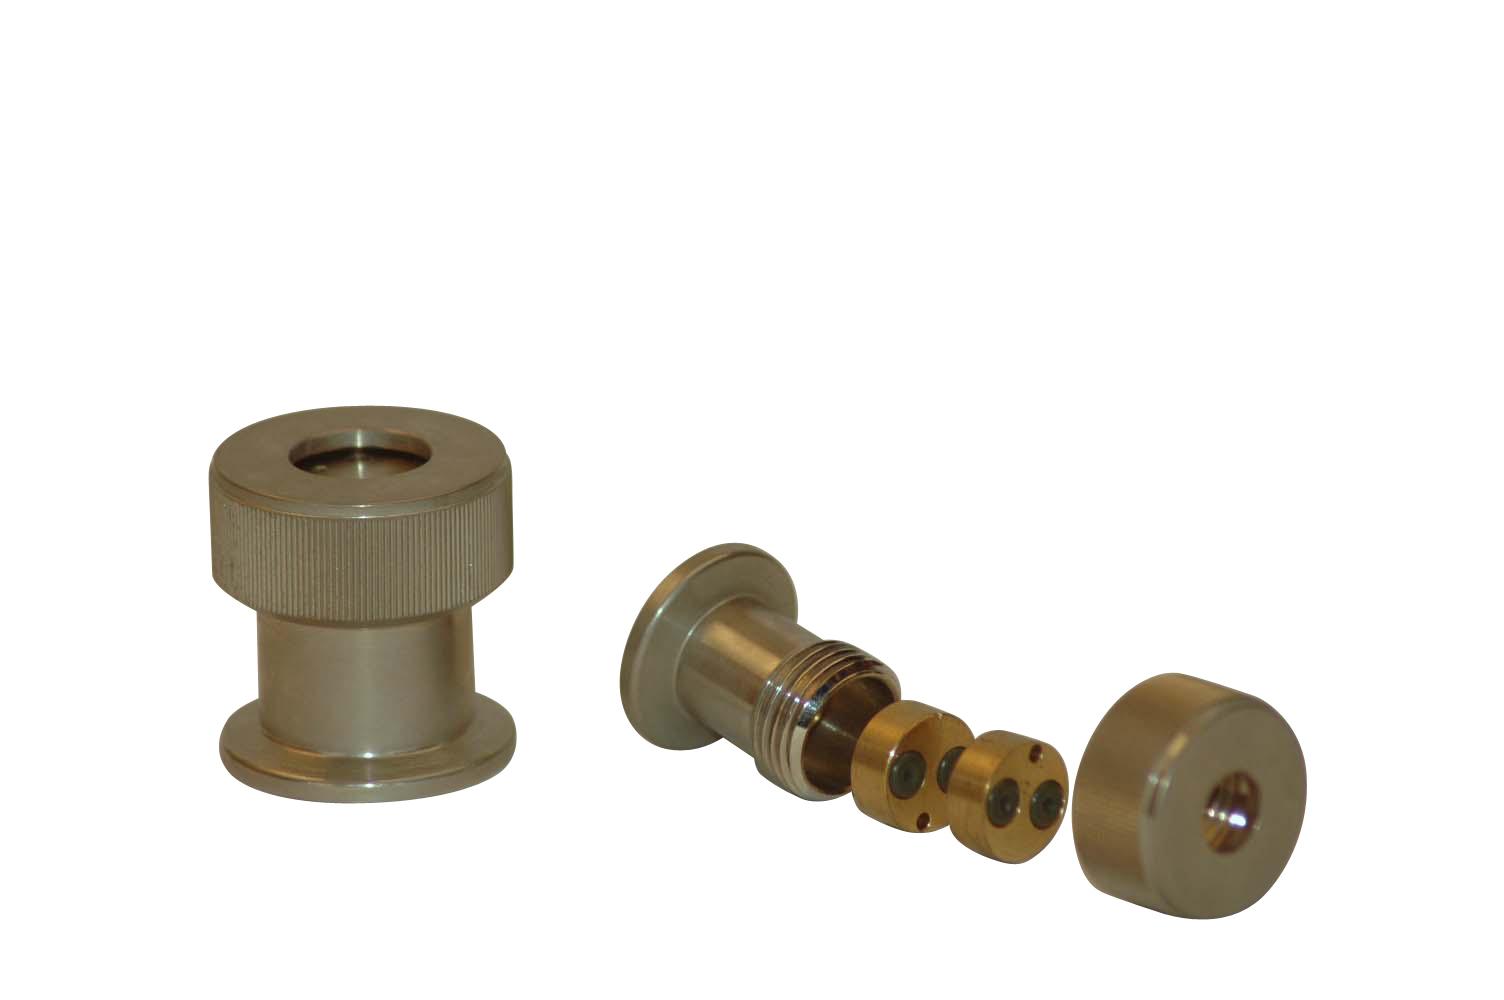 Themocouple feedthrough 7 pins, stainless steel, DN40KF